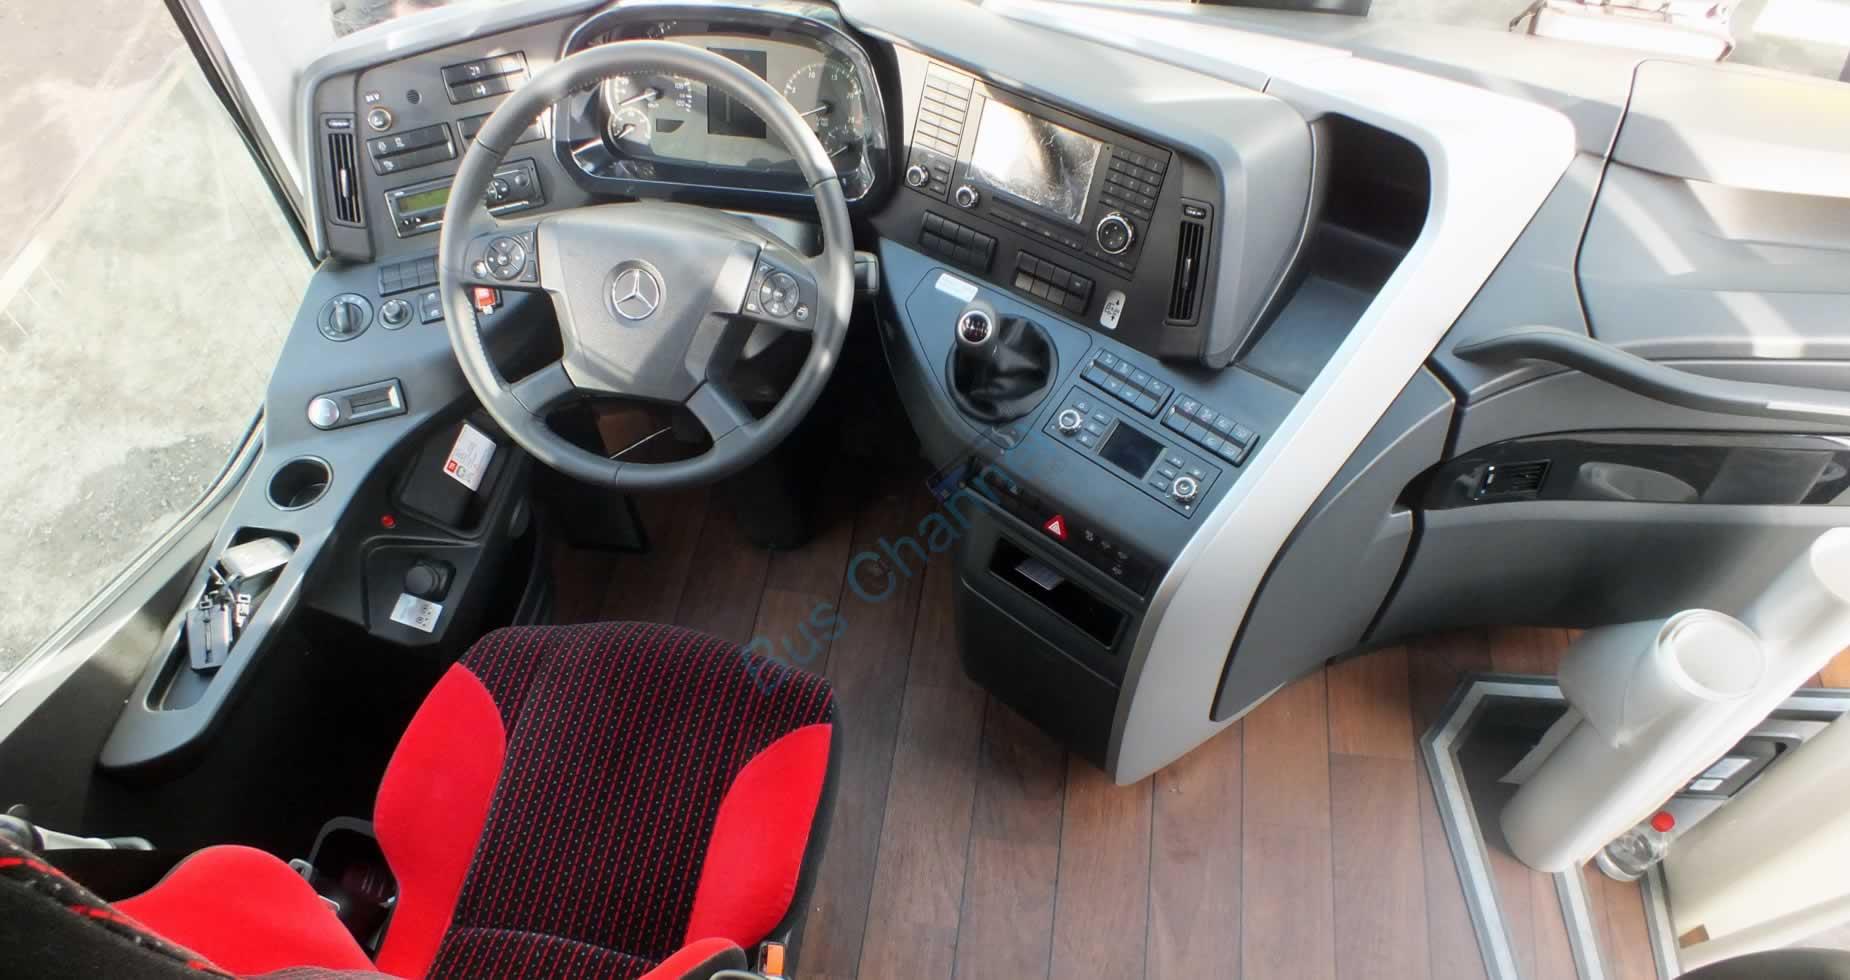 2016 Mercedes Travego 15 SHD - Oto Kokpit